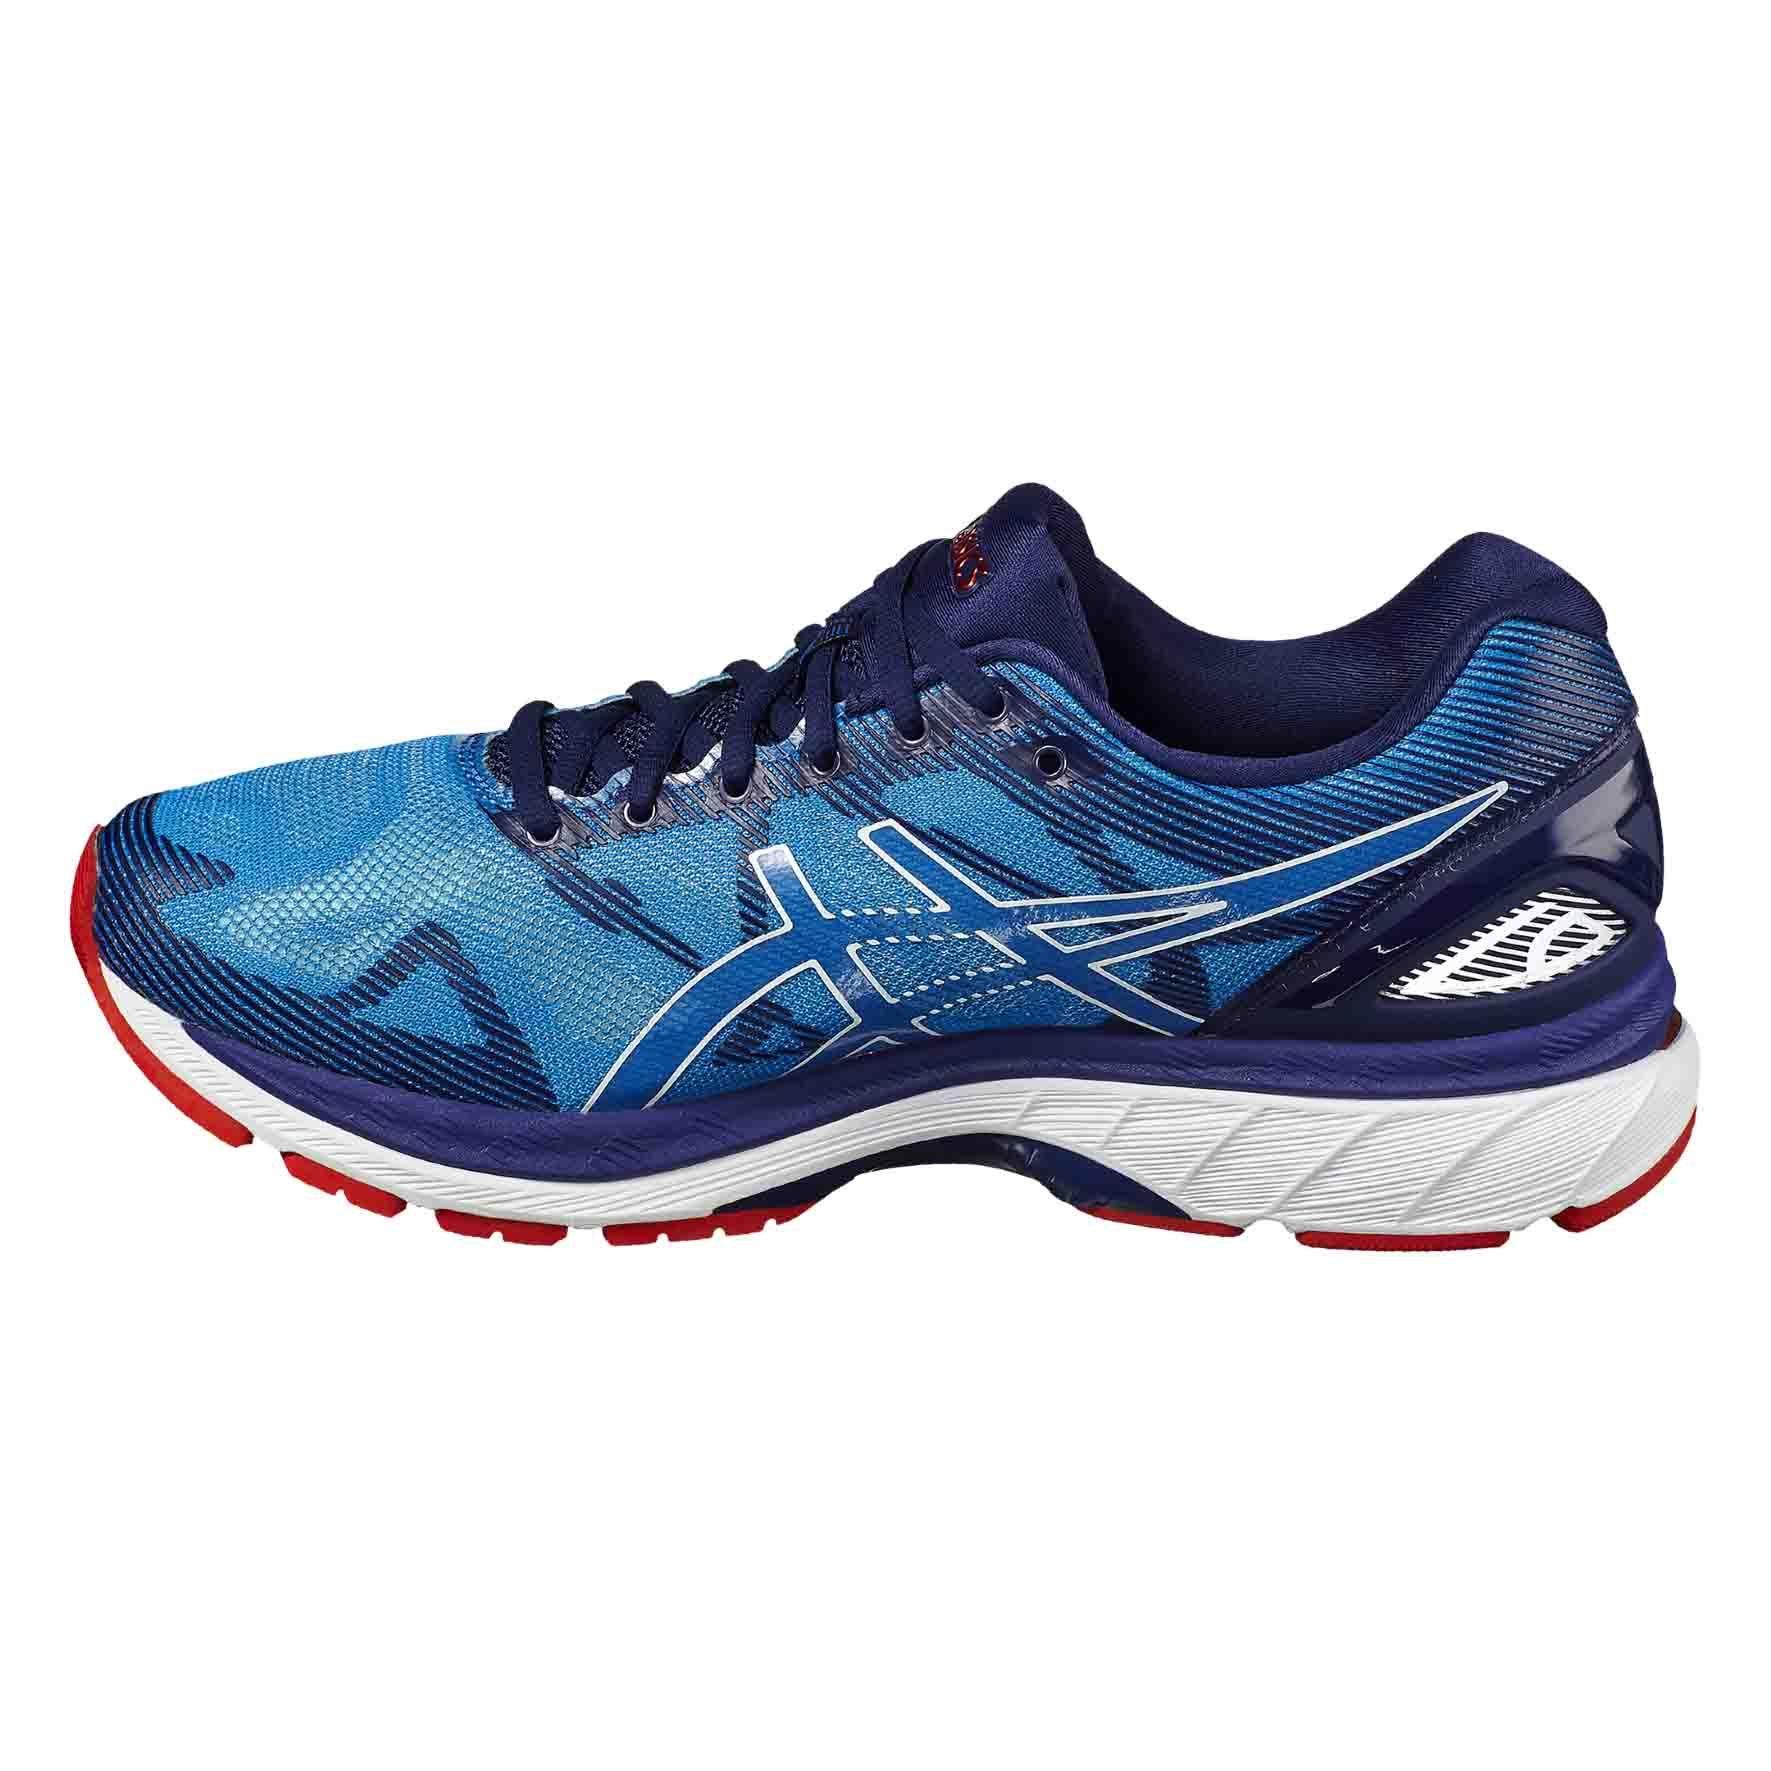 Asics Sports Shoes For Men